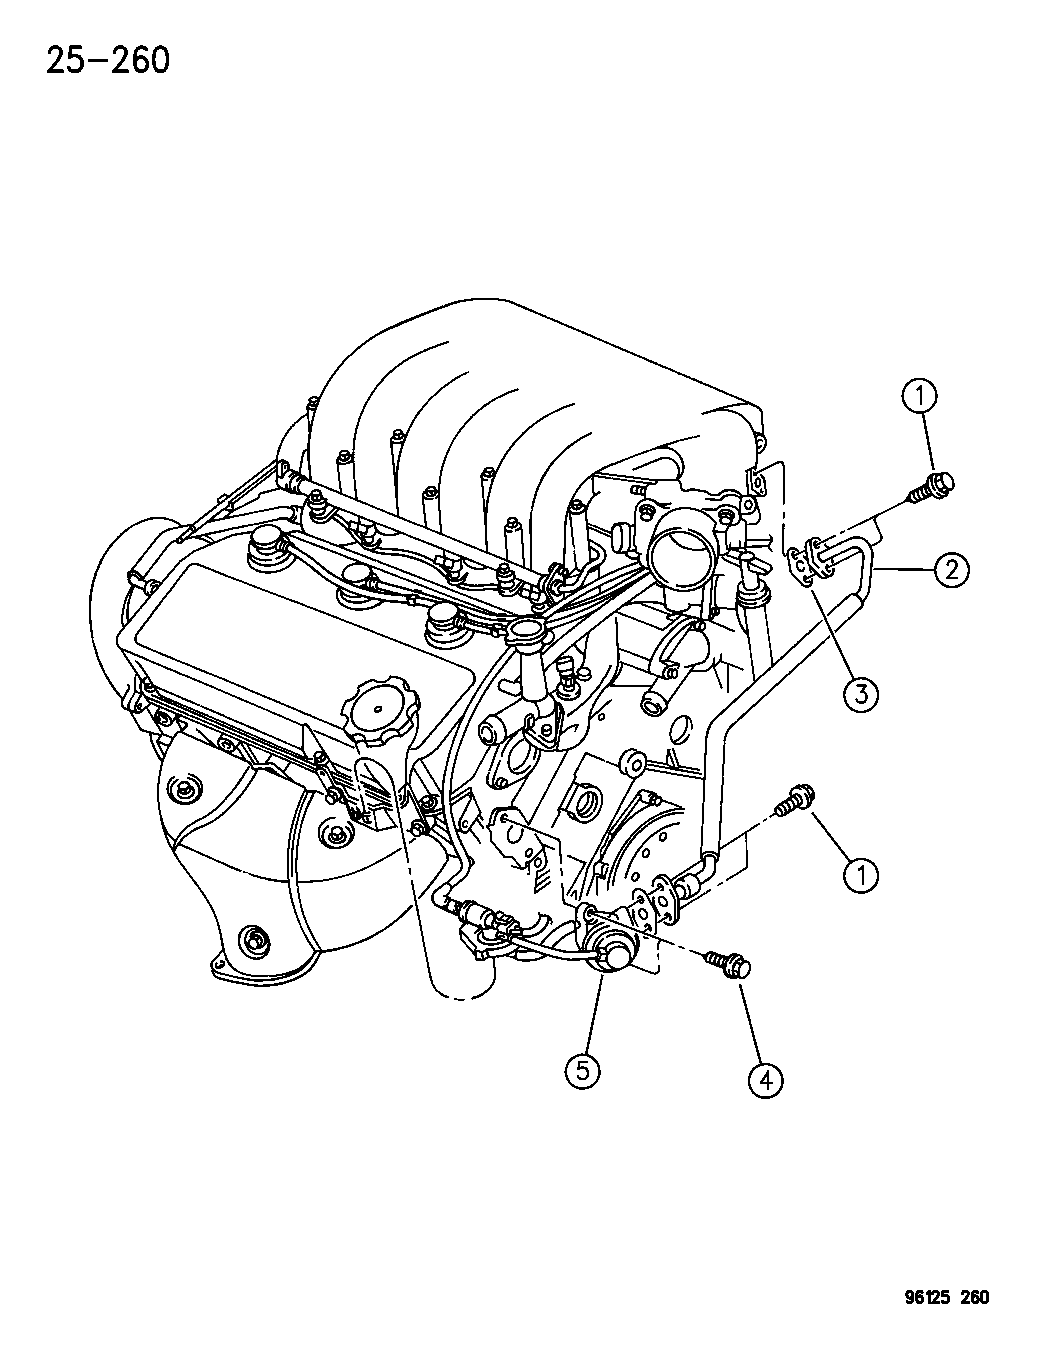 2007 Chrysler Sebring Fuse Box Diagram Asd Relay 2002 Print 97 Cirrus Location 1996 Convertible Egr System Thumbnail 2